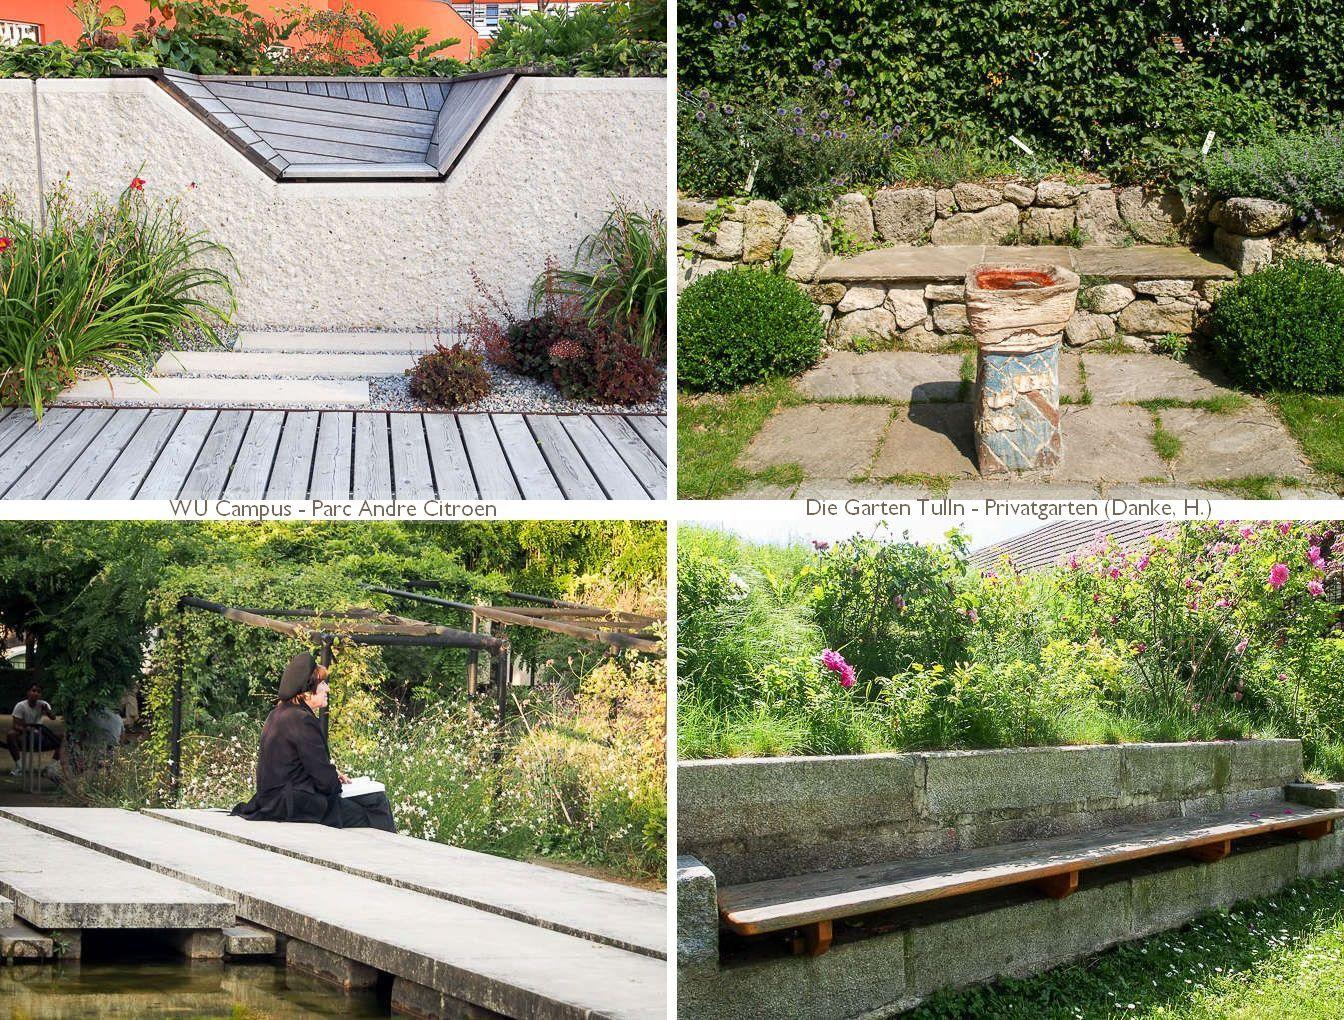 vier fix eingebaute Sitze in Gärten